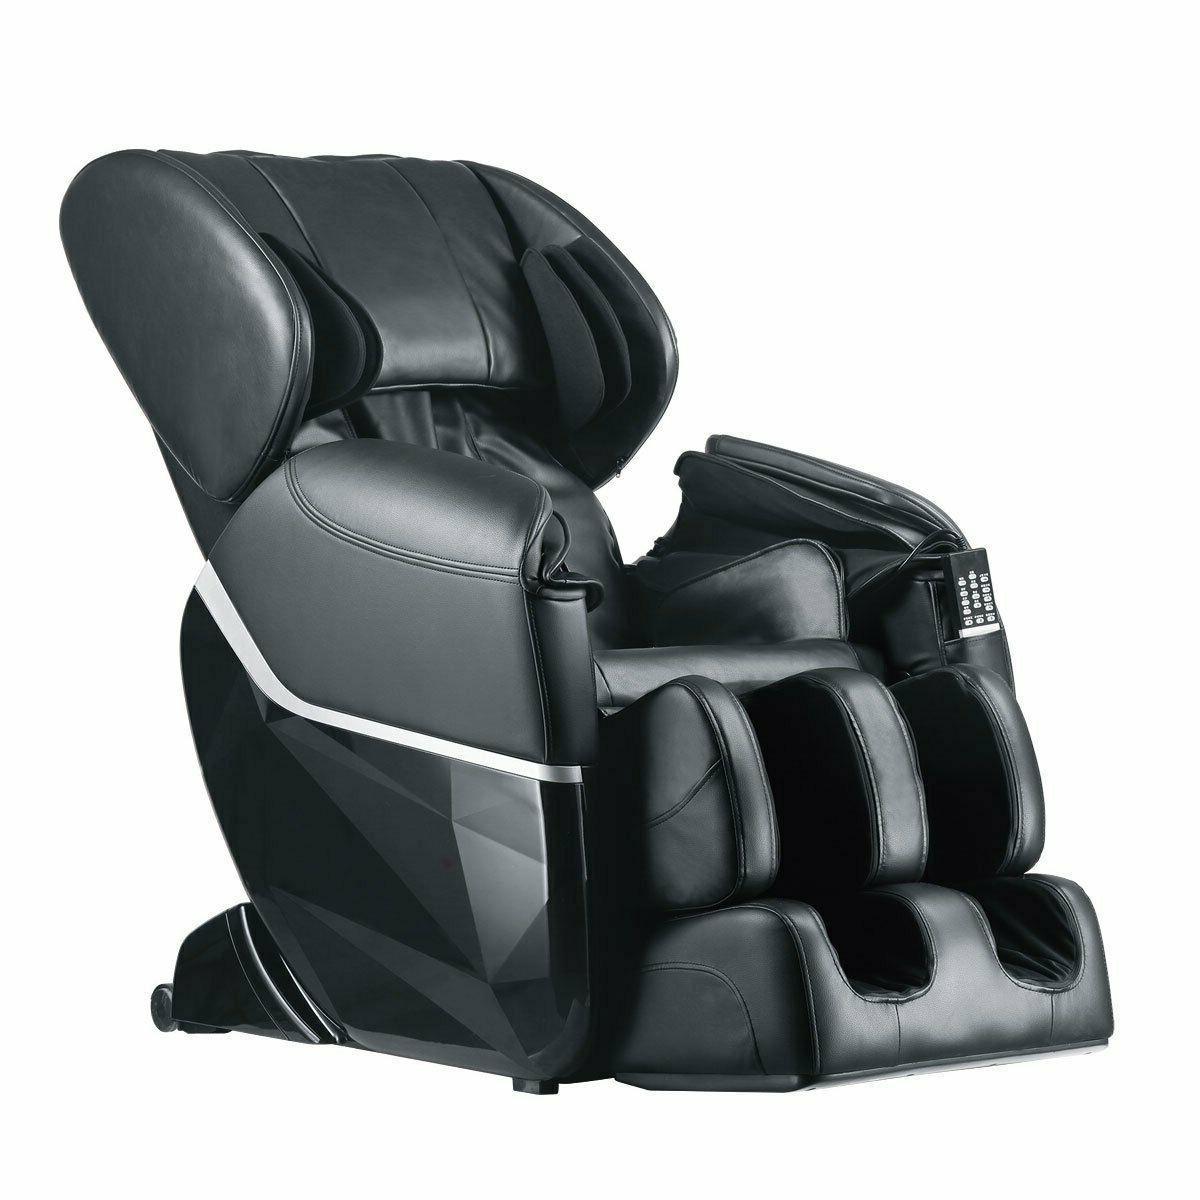 new electric full body shiatsu massage chair